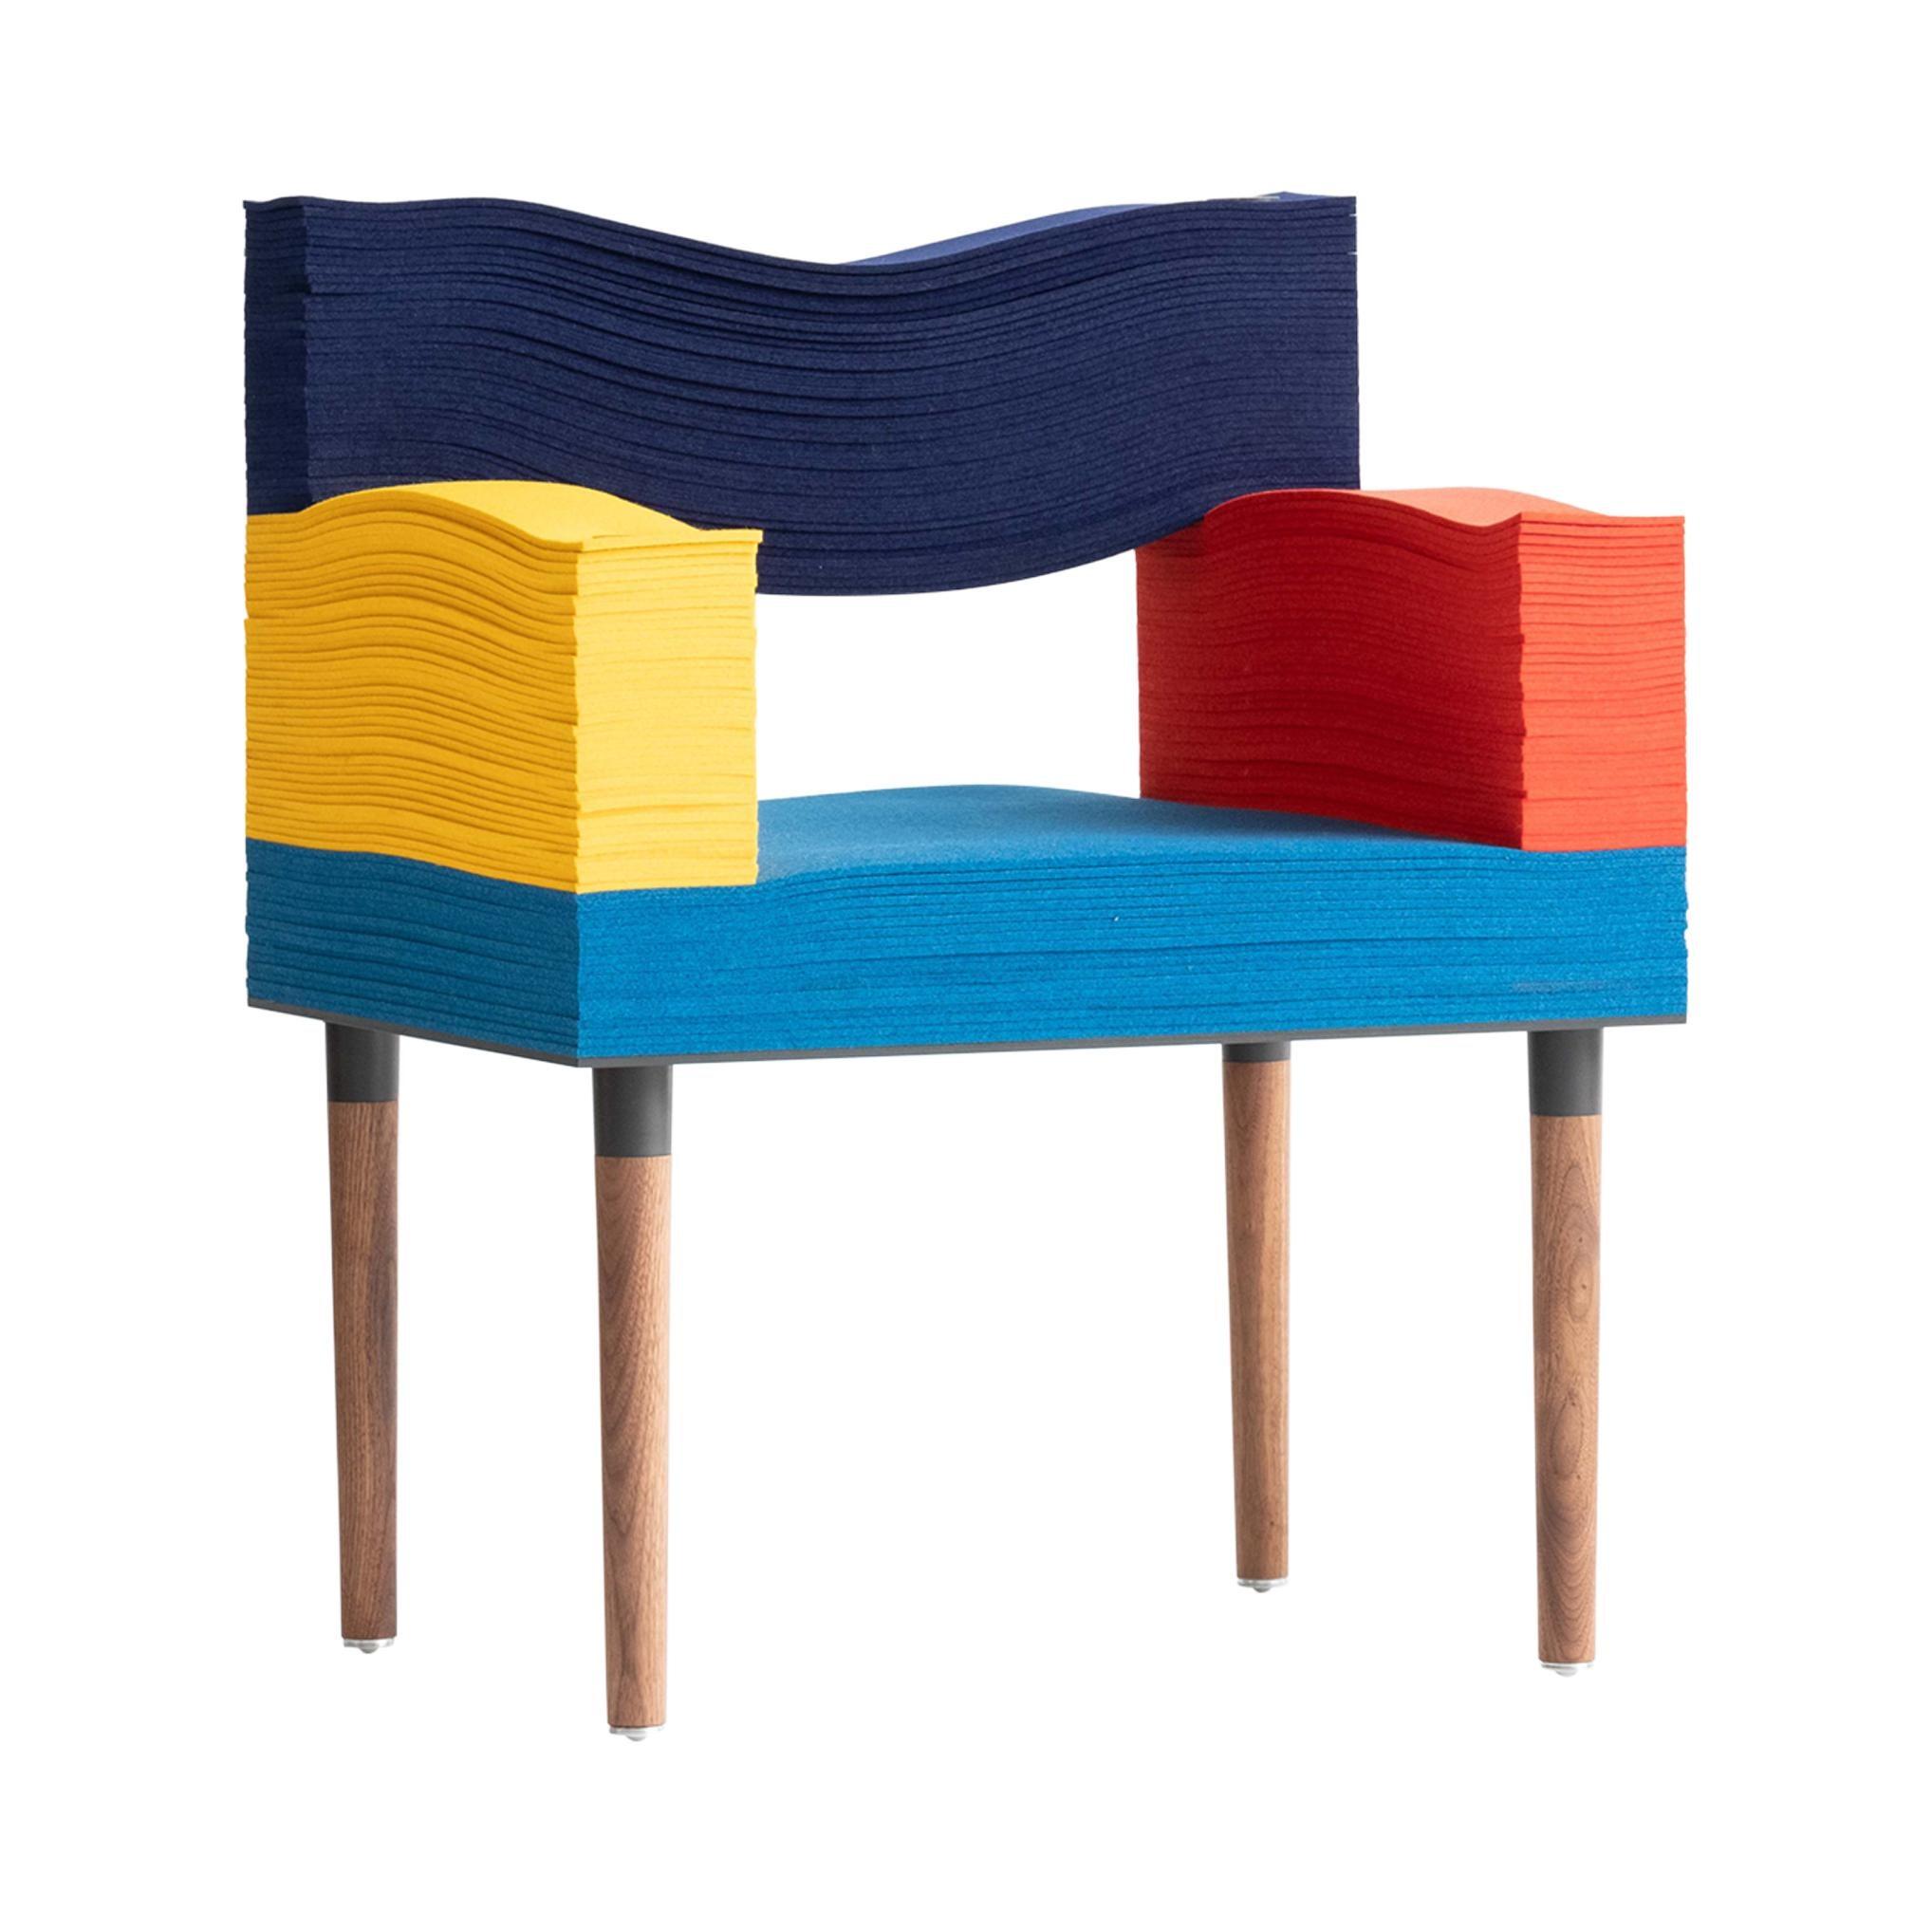 Contemporary Felt Series Armchair Merino Wool Felt and Walnut by Stacklab